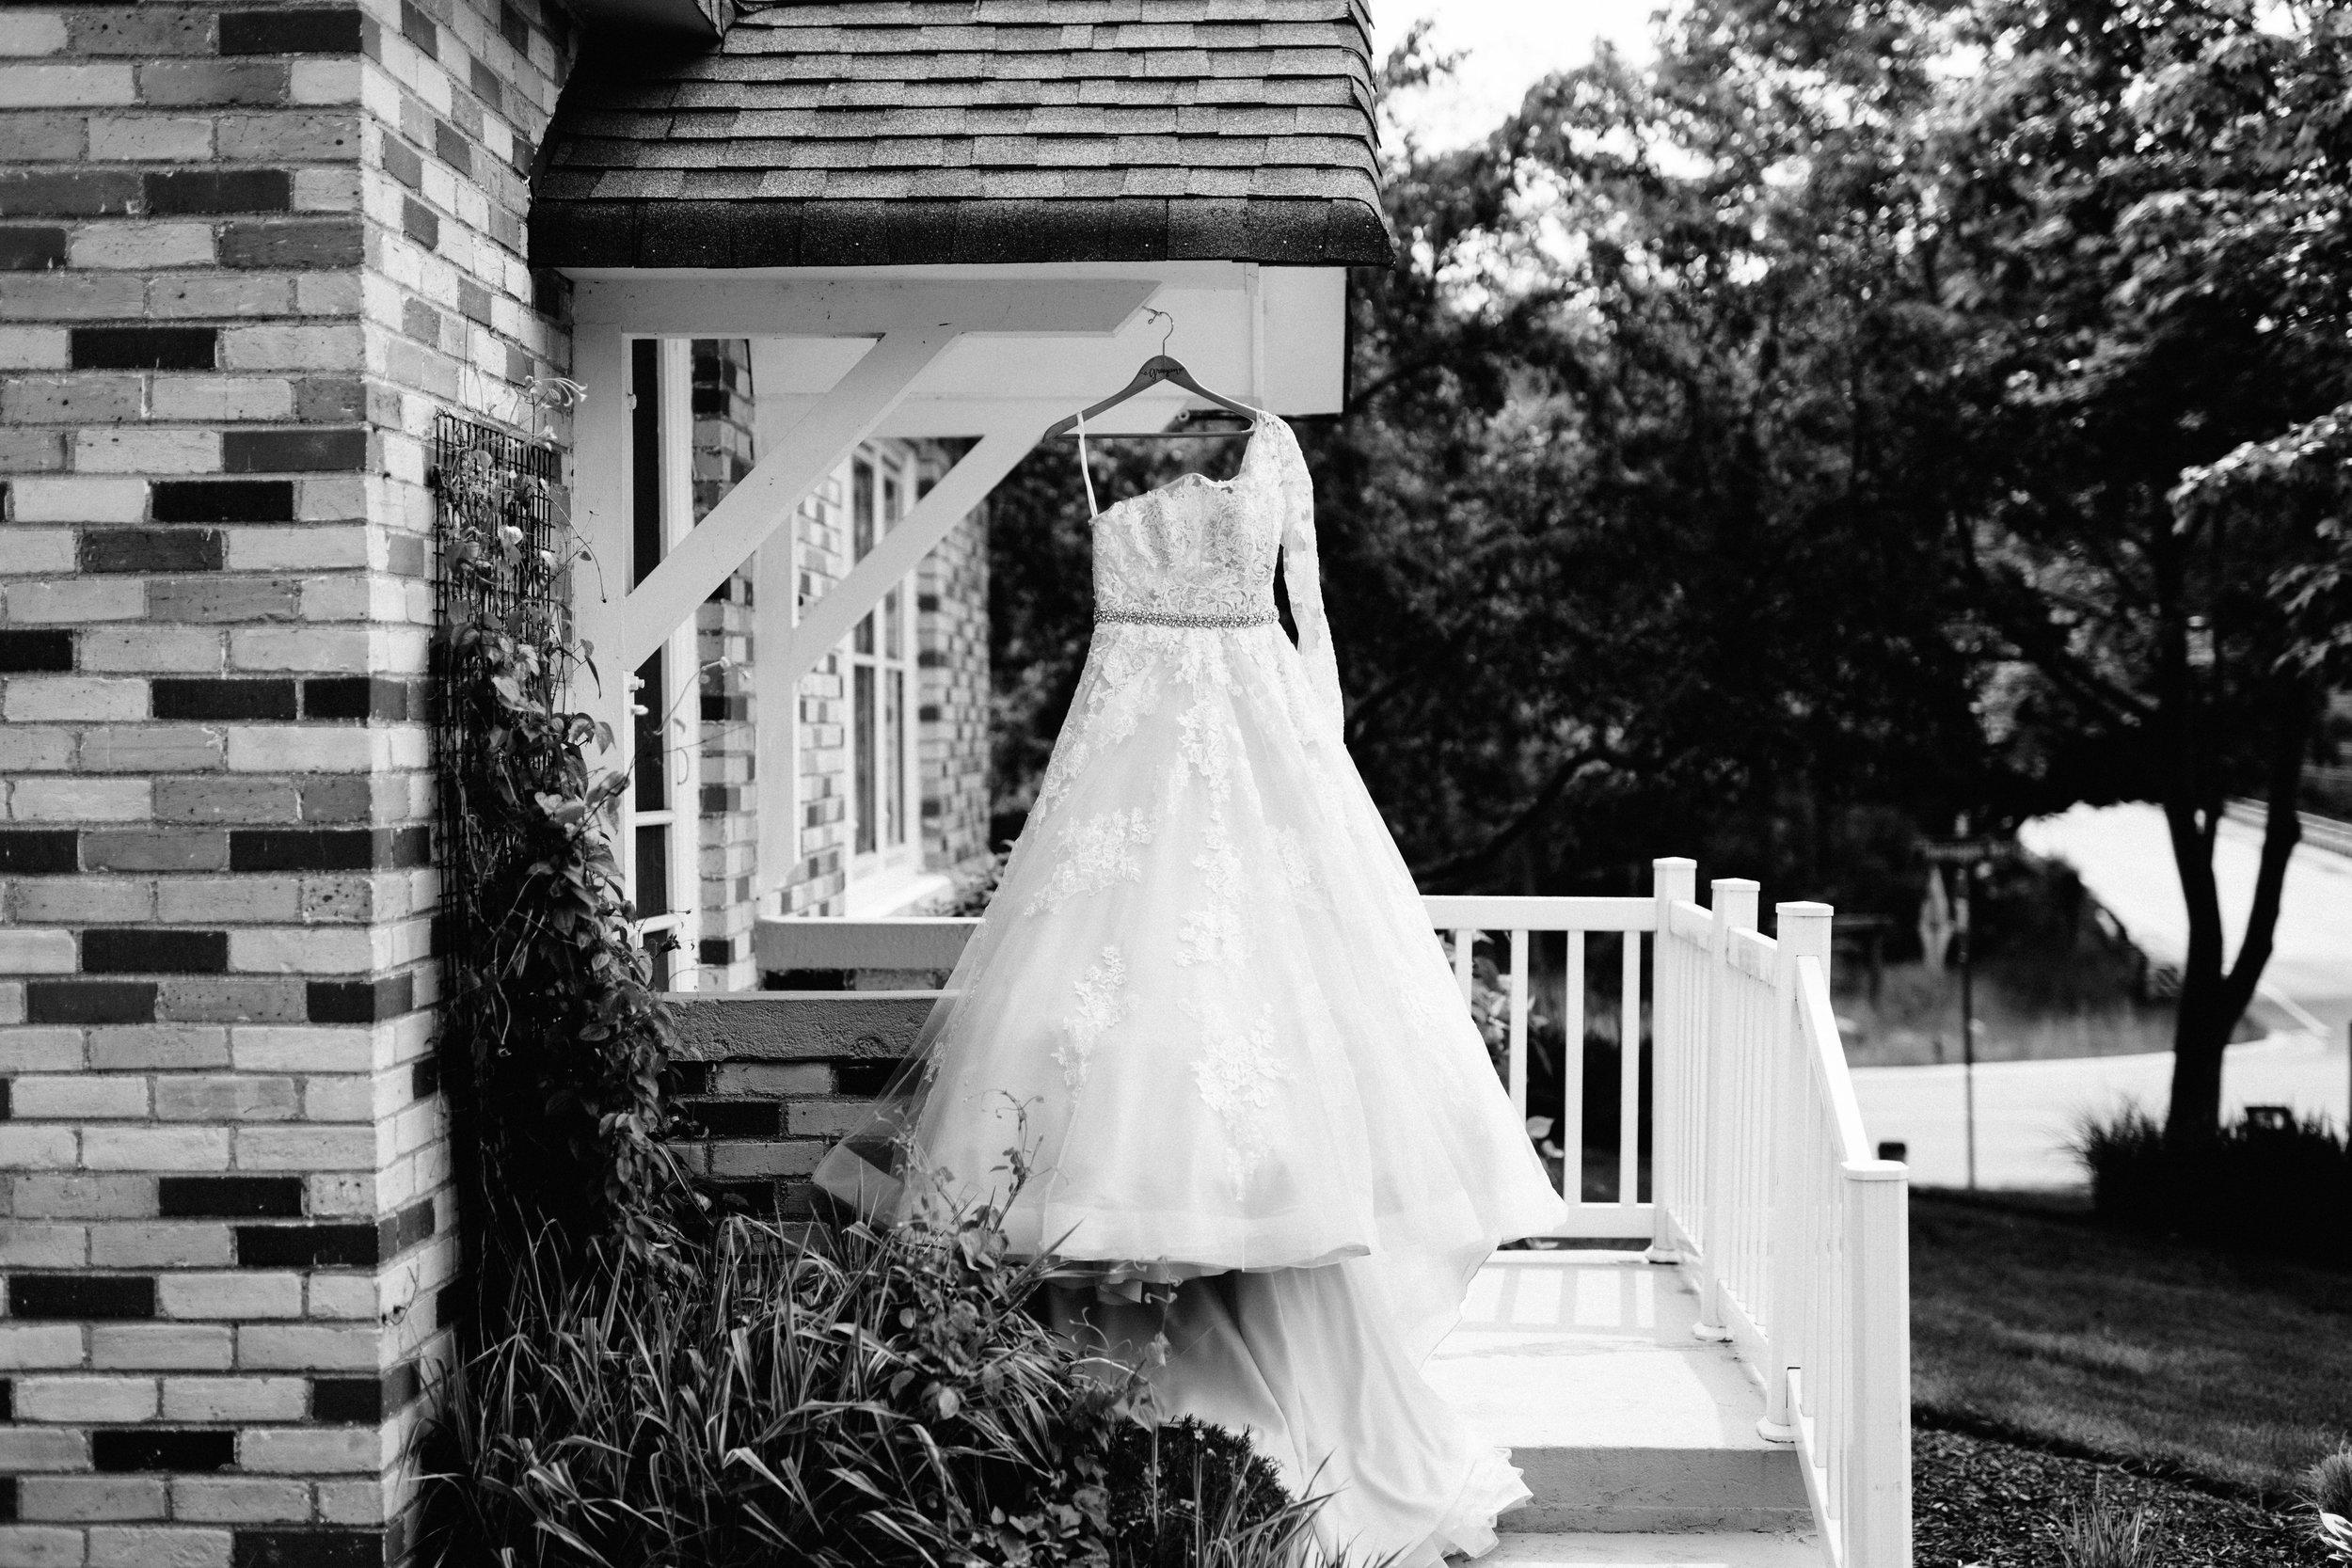 GRAYCENTOMHAMILTON-GRAND-RAPIDS-WEDDING-PHOTOGRAPHY-01.jpg